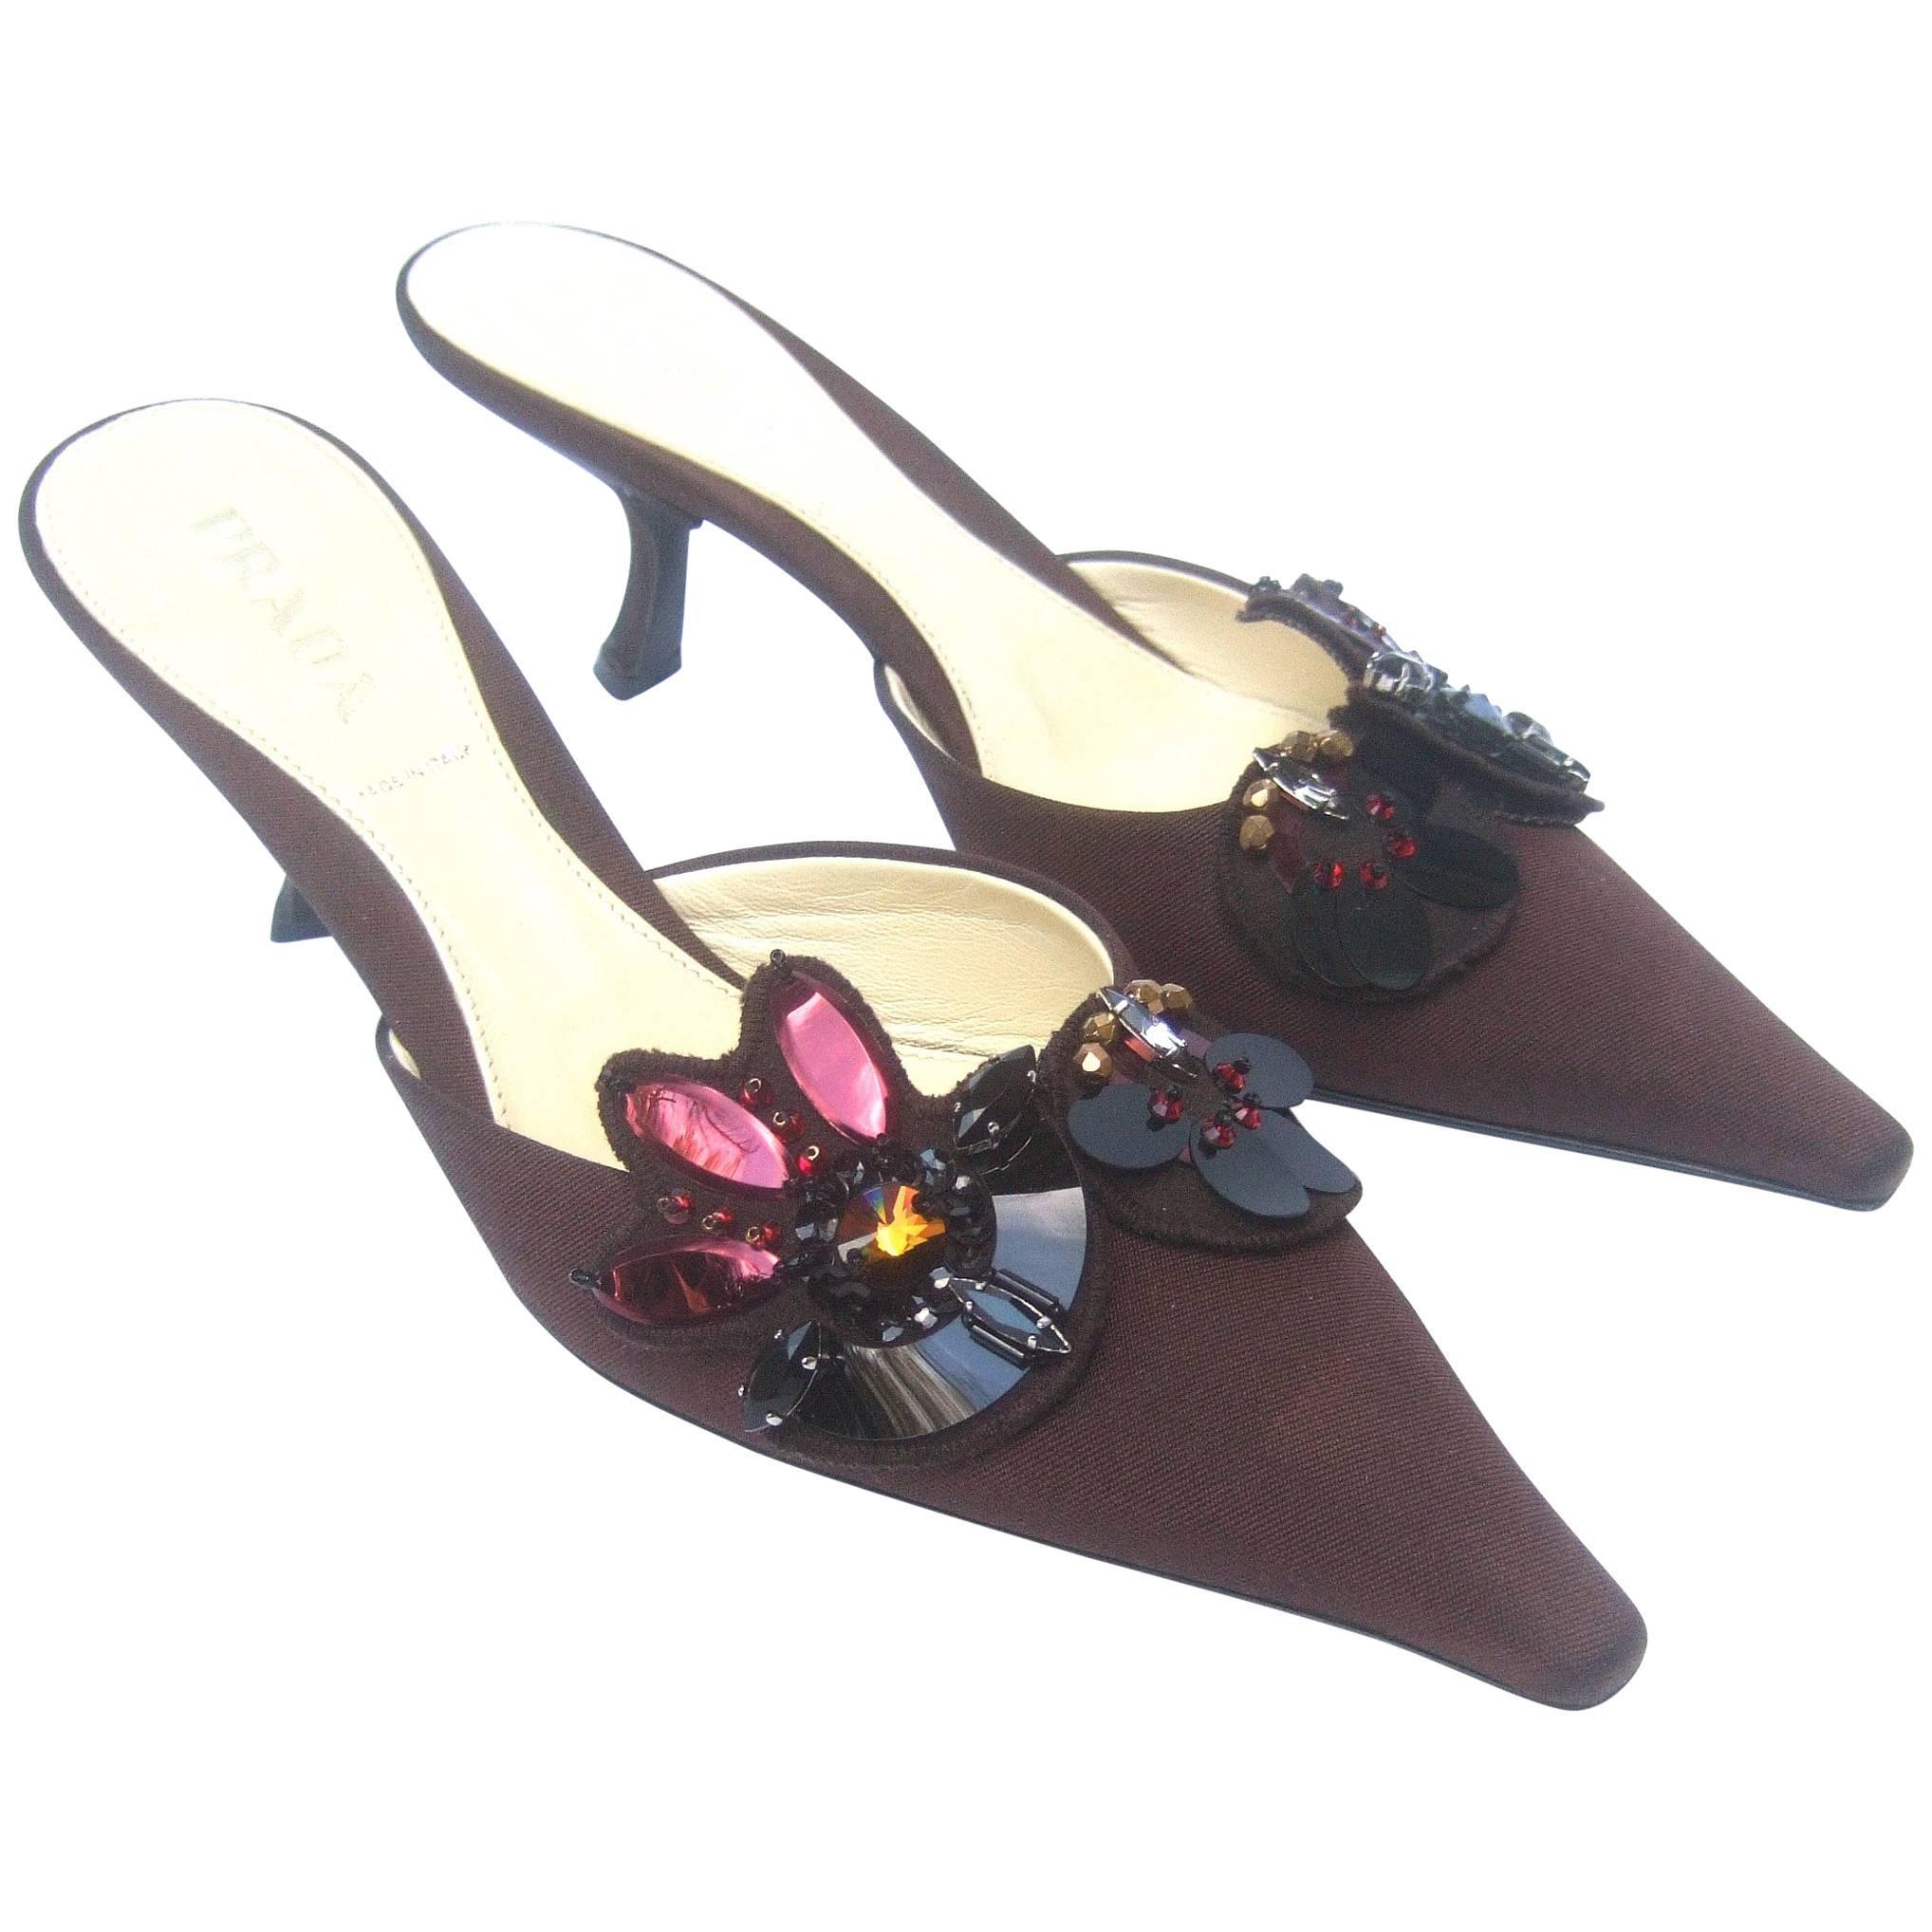 Prada Italy Chocolate Brown Jeweled Satin Mules in Box Size 37